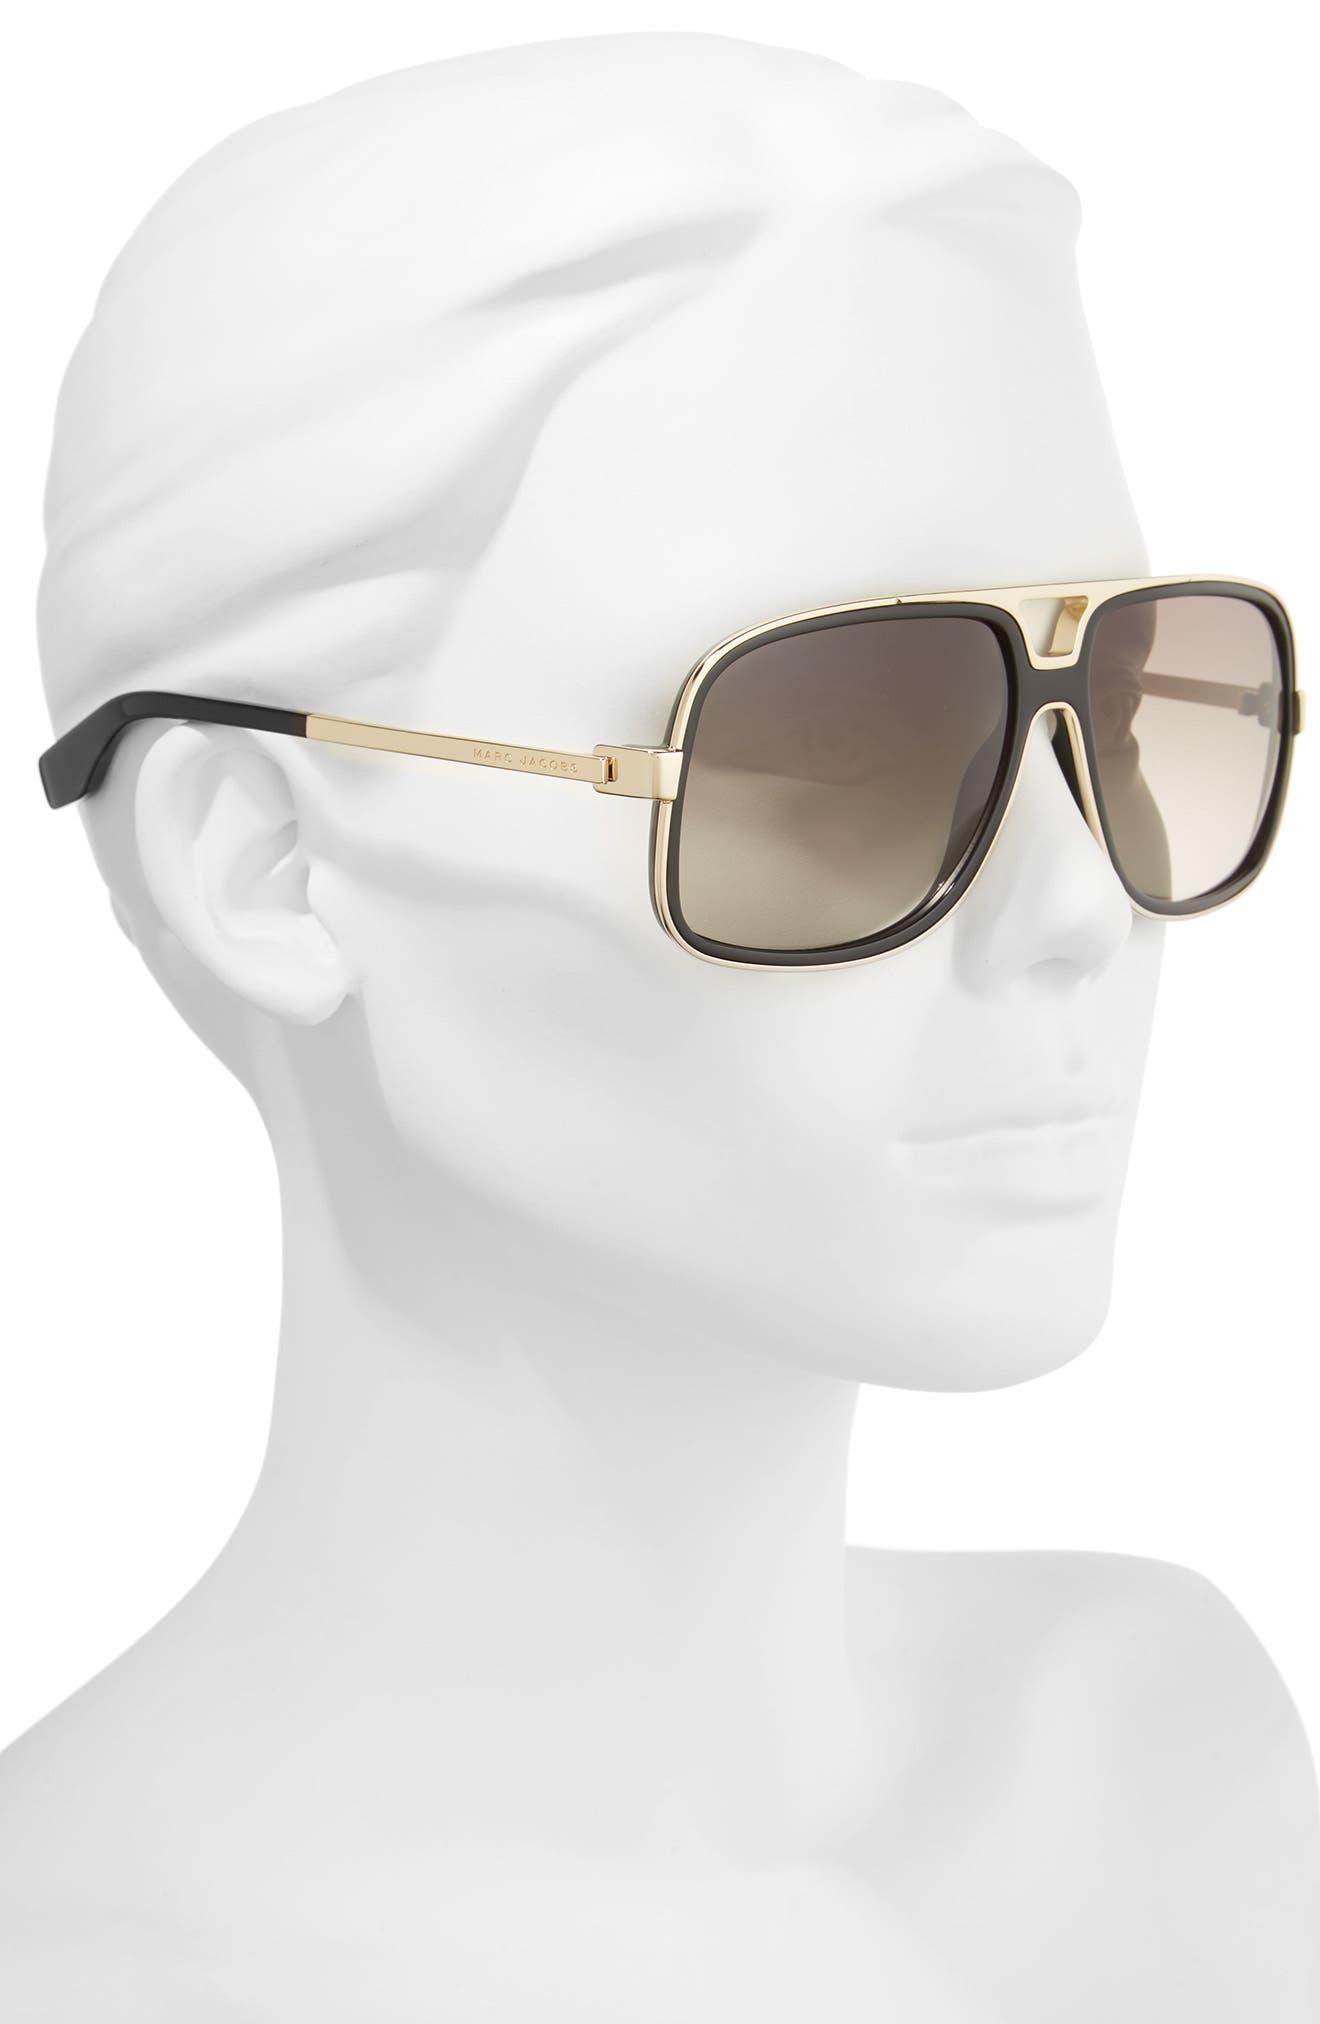 60mm Gradient Lens Aviator Sunglasses,                             Alternate thumbnail 2, color,                             BLACK